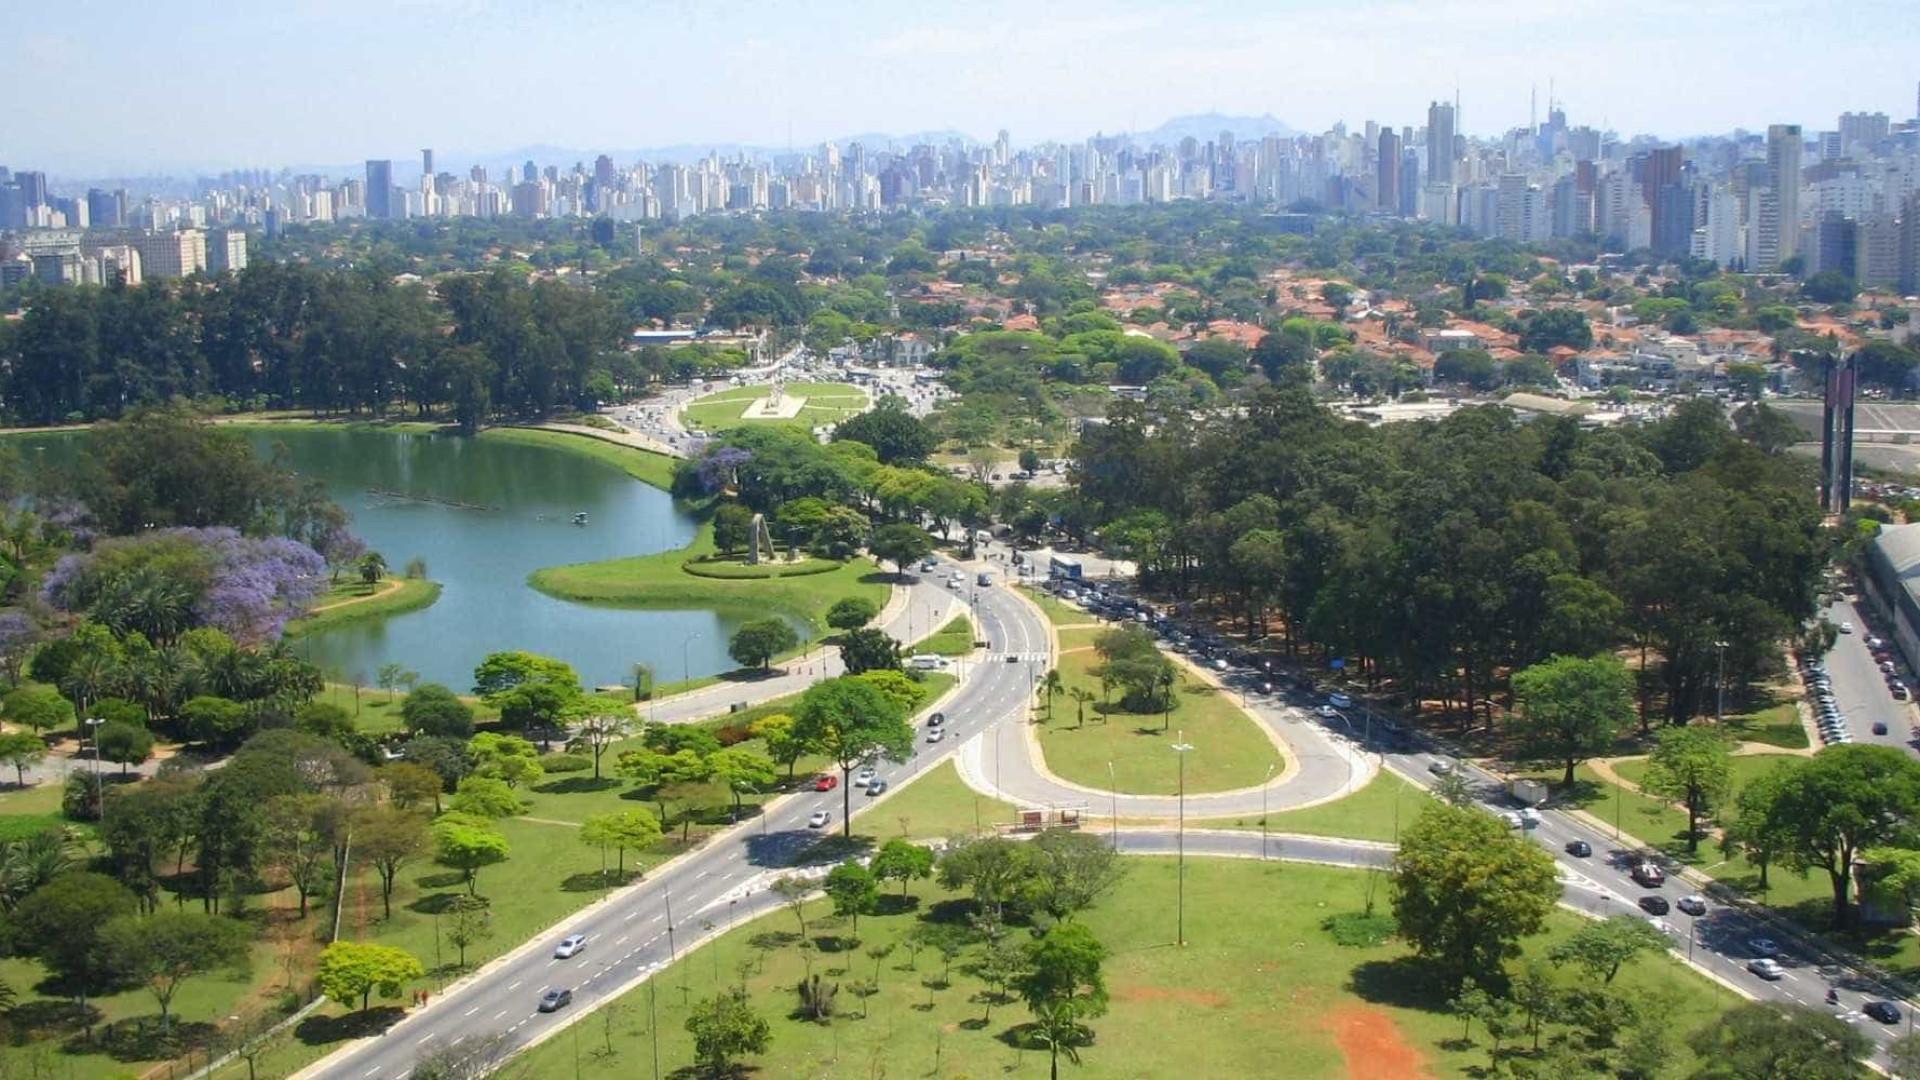 Criminosos se entregam após tiroteio no Parque do Ibirapuera